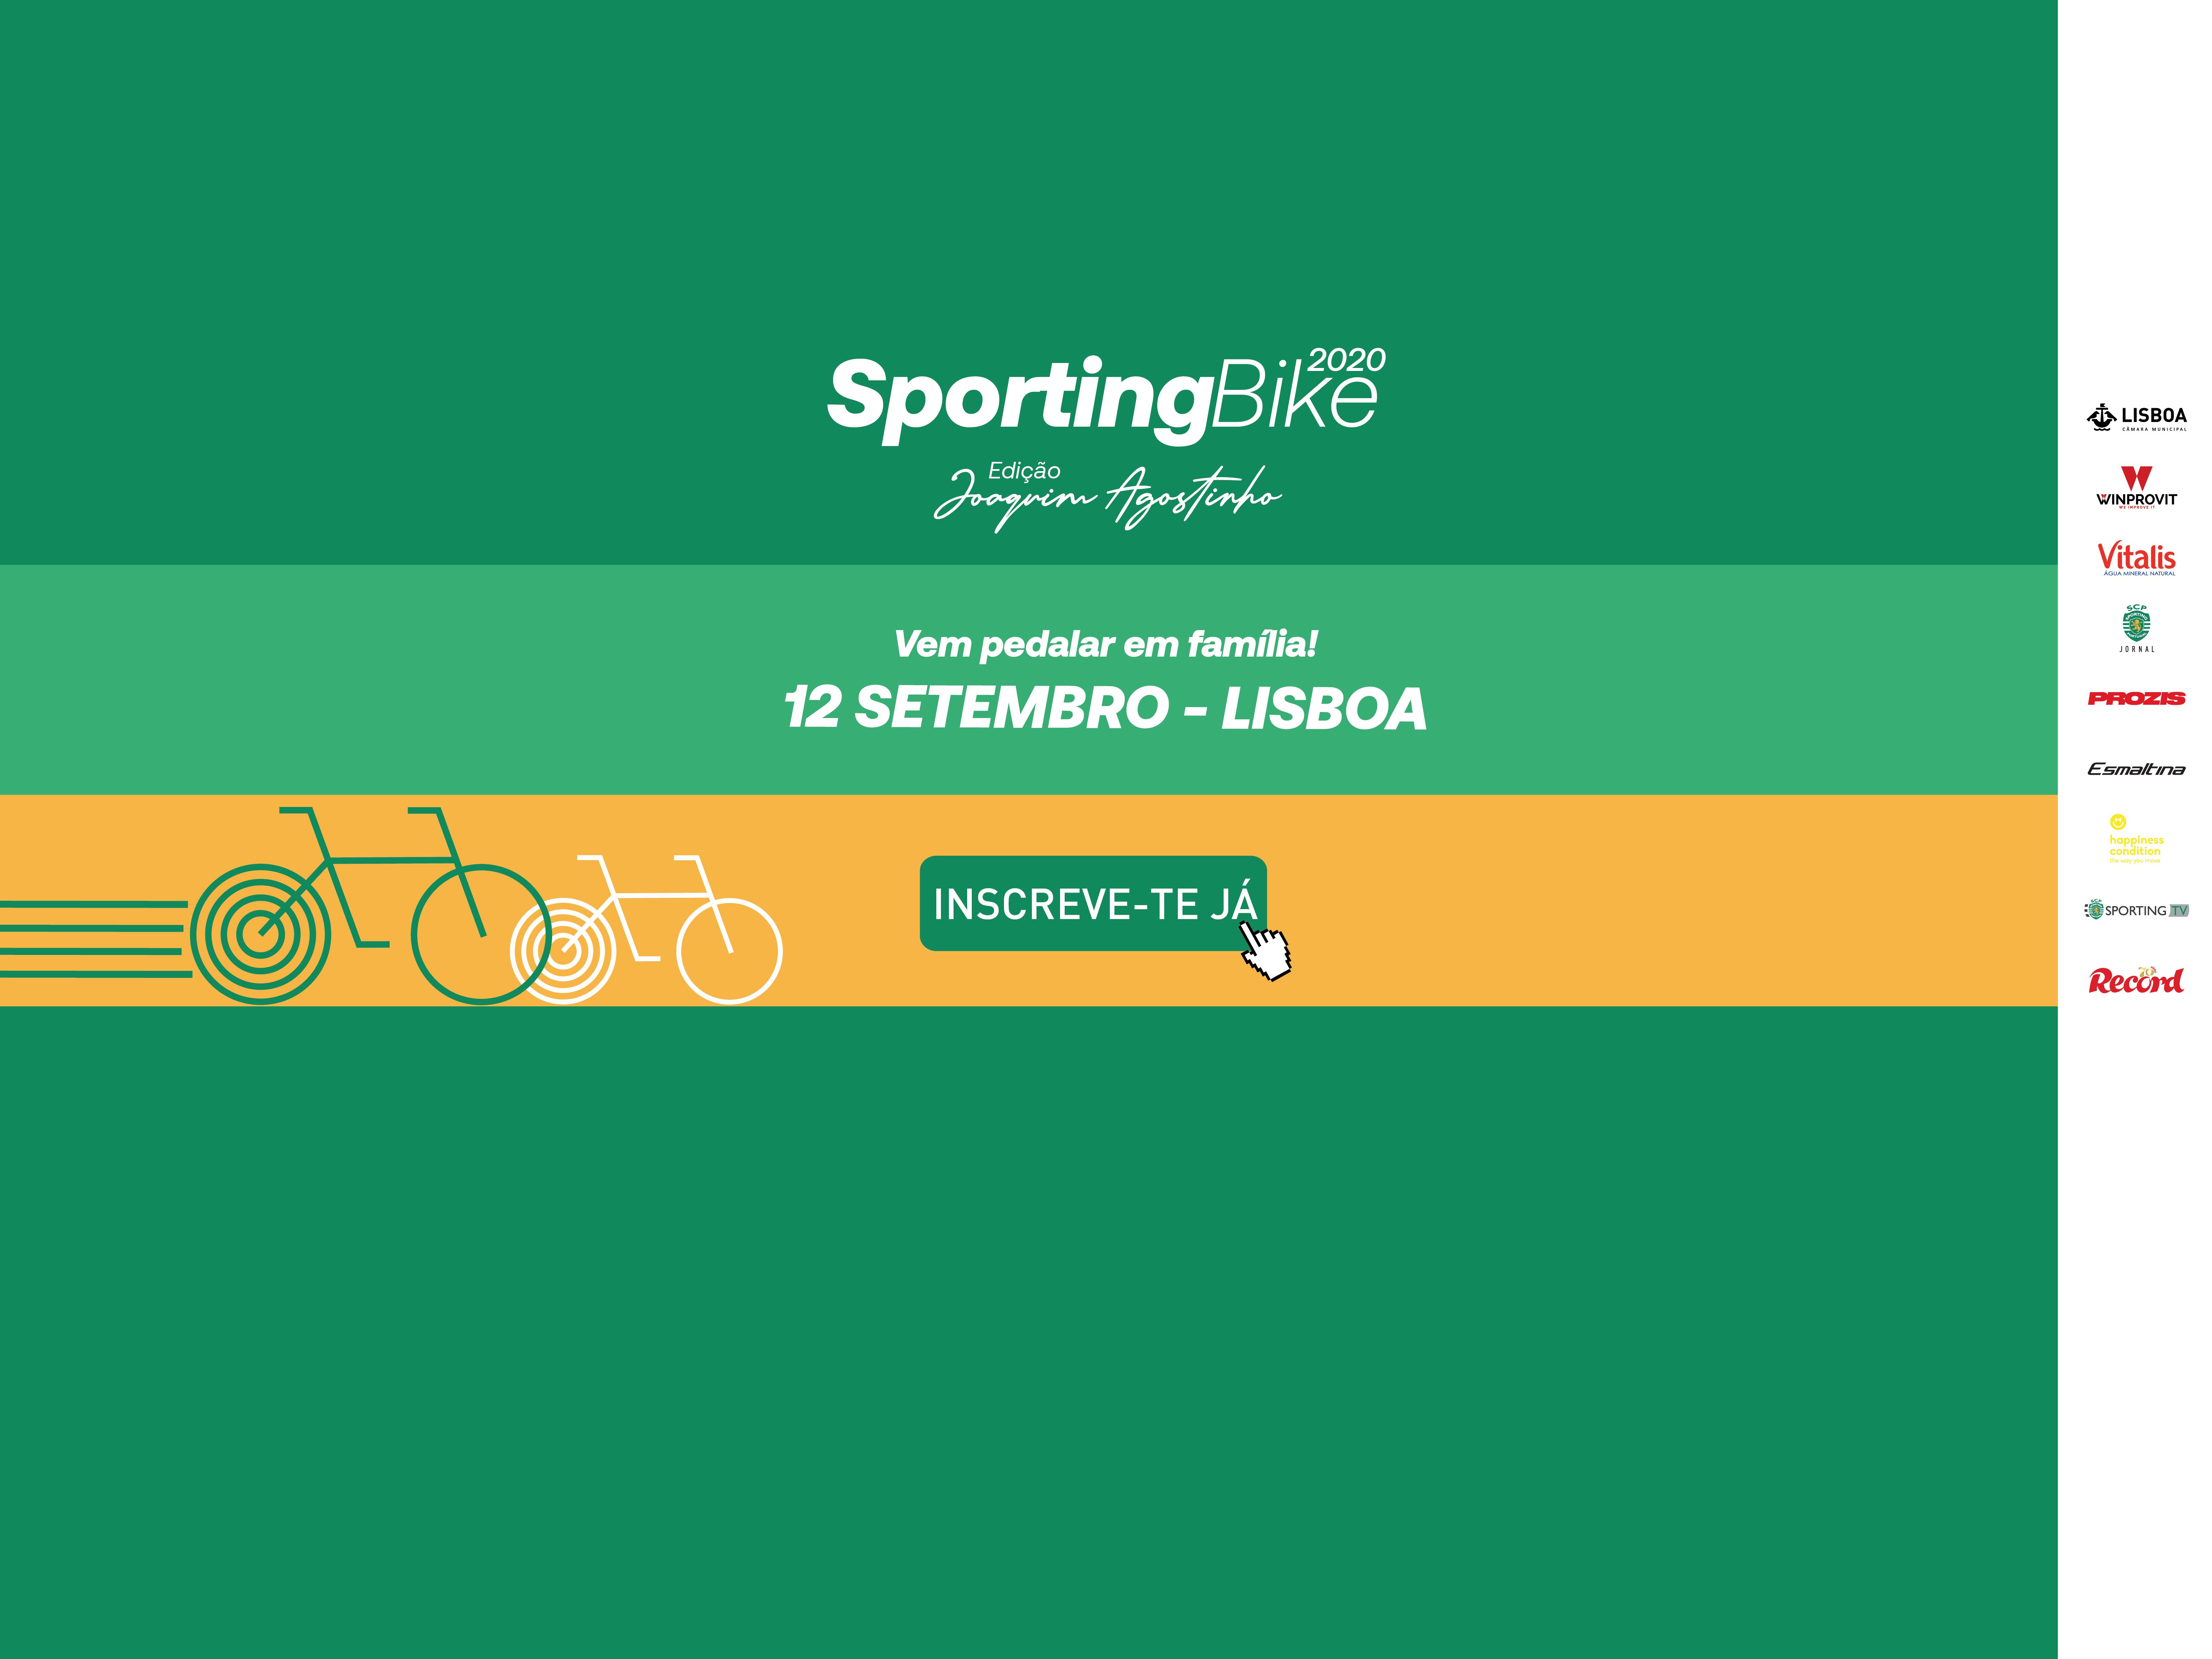 https://scpconteudos.pt/sites/default/files/revslider/image/Banner%20HP_Sporting%20Bike-01_2.jpg